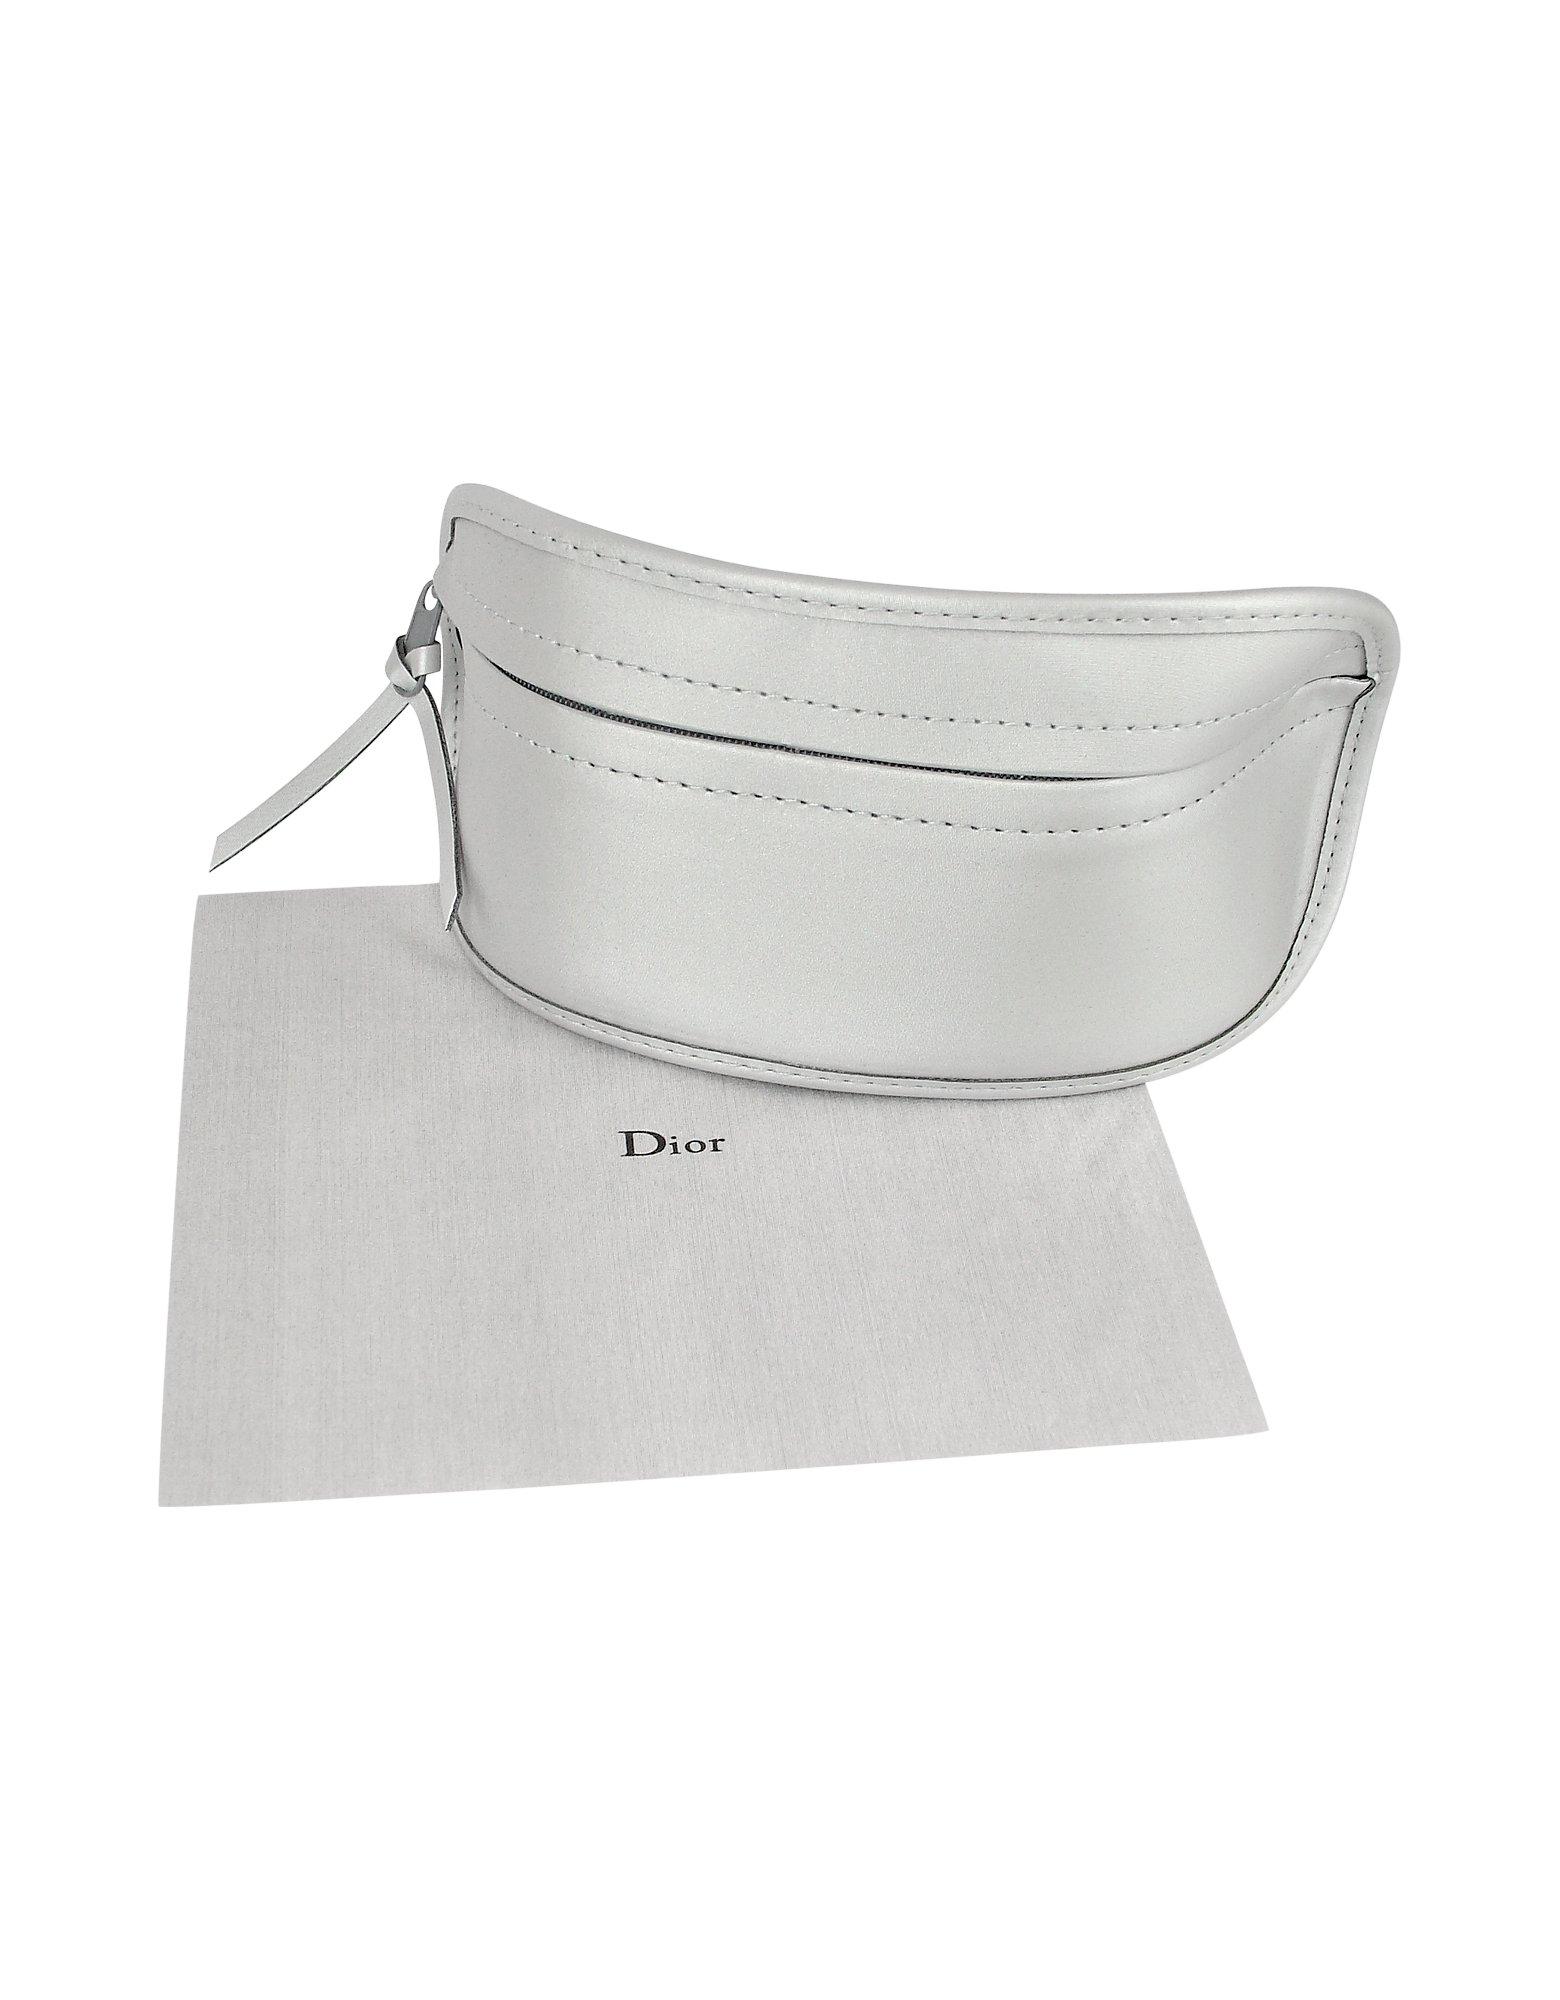 055c5426fd Lyst - Dior Suite Rimless Shield Sunglasses in Metallic